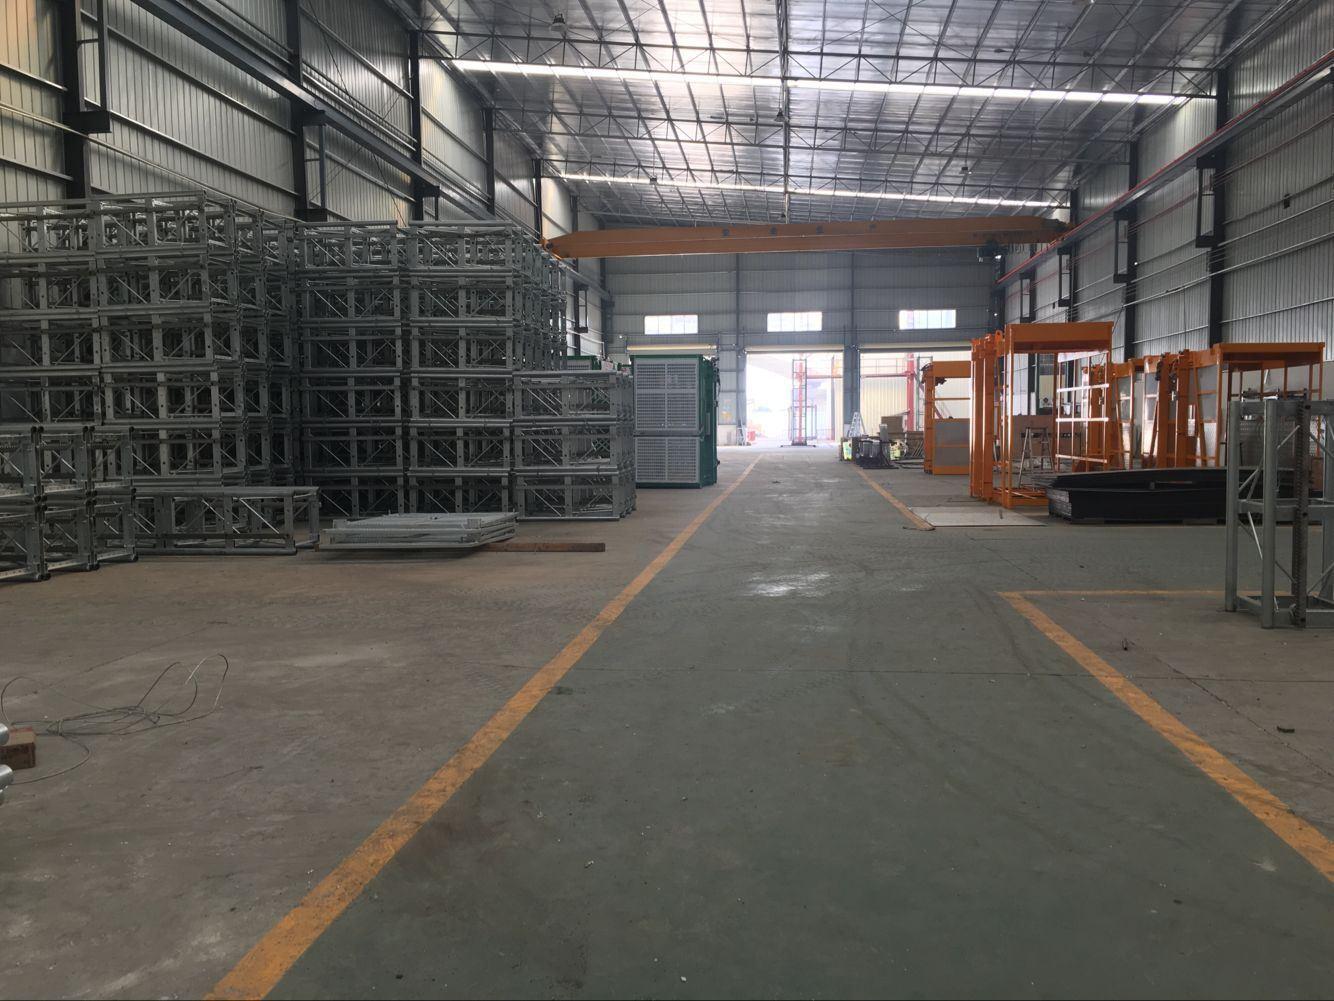 Sc120/120 Frequency Inverter Building Hoist for Lean Construction Site